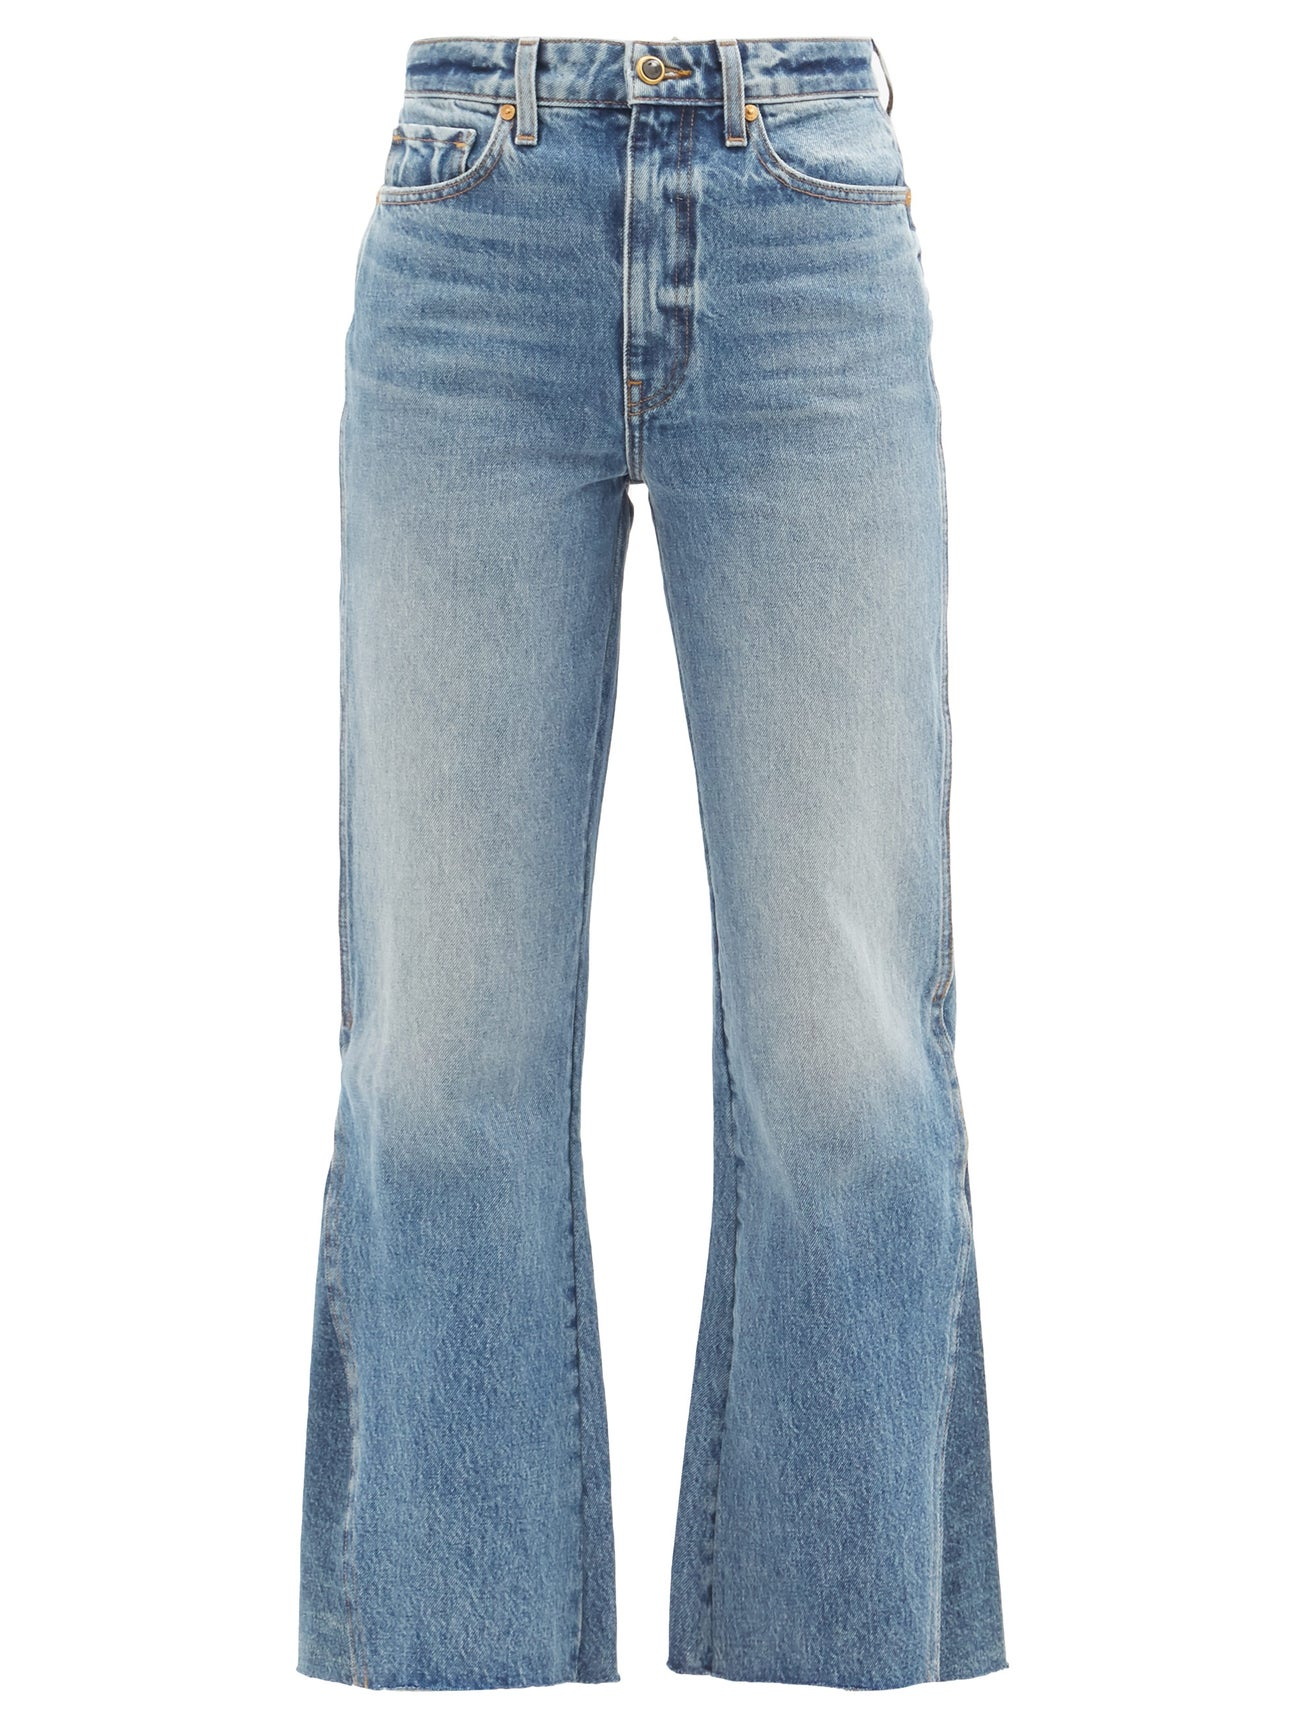 KHAITE Layla high-rise kick-flare jeans